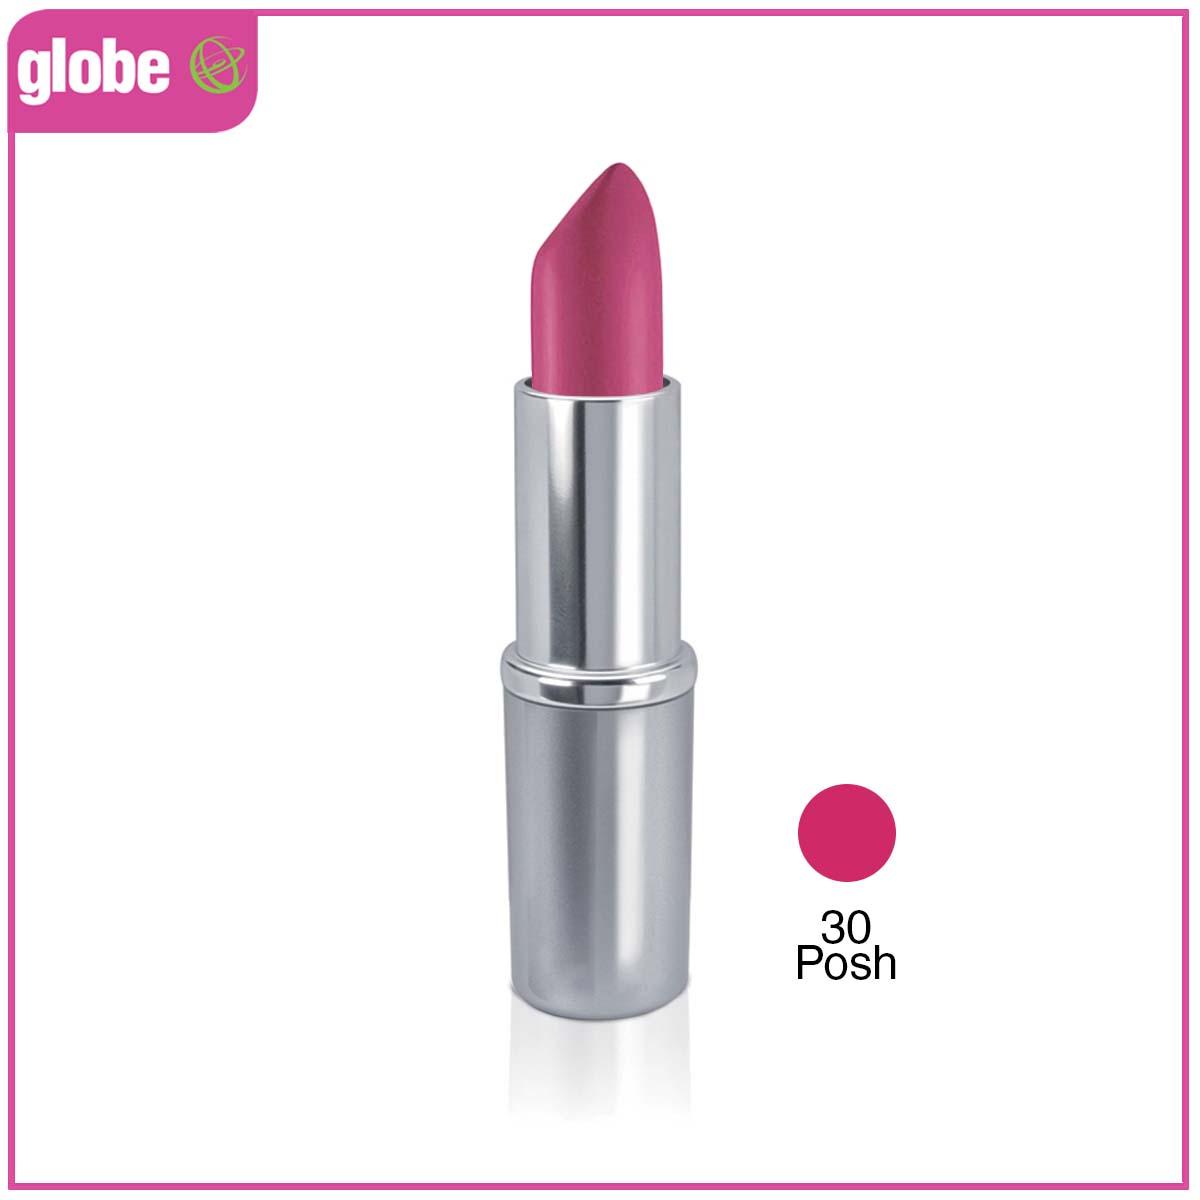 Silkygirl Moisture Rich Lipcolor 30 Posh (Pcs)